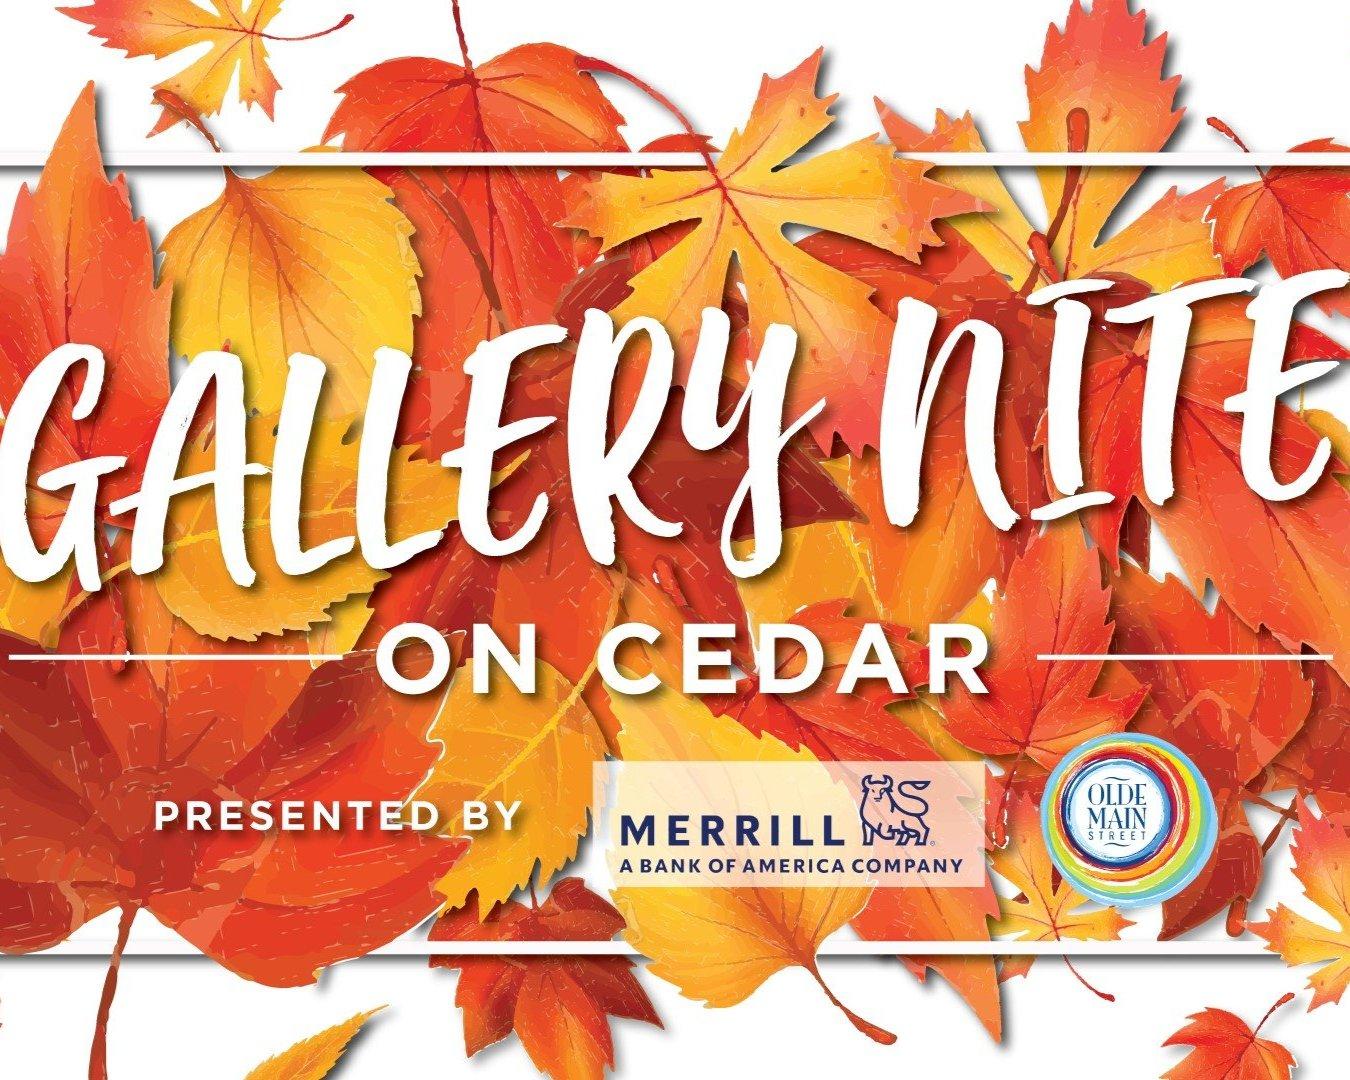 Gallery Nite on Cedar - Art event